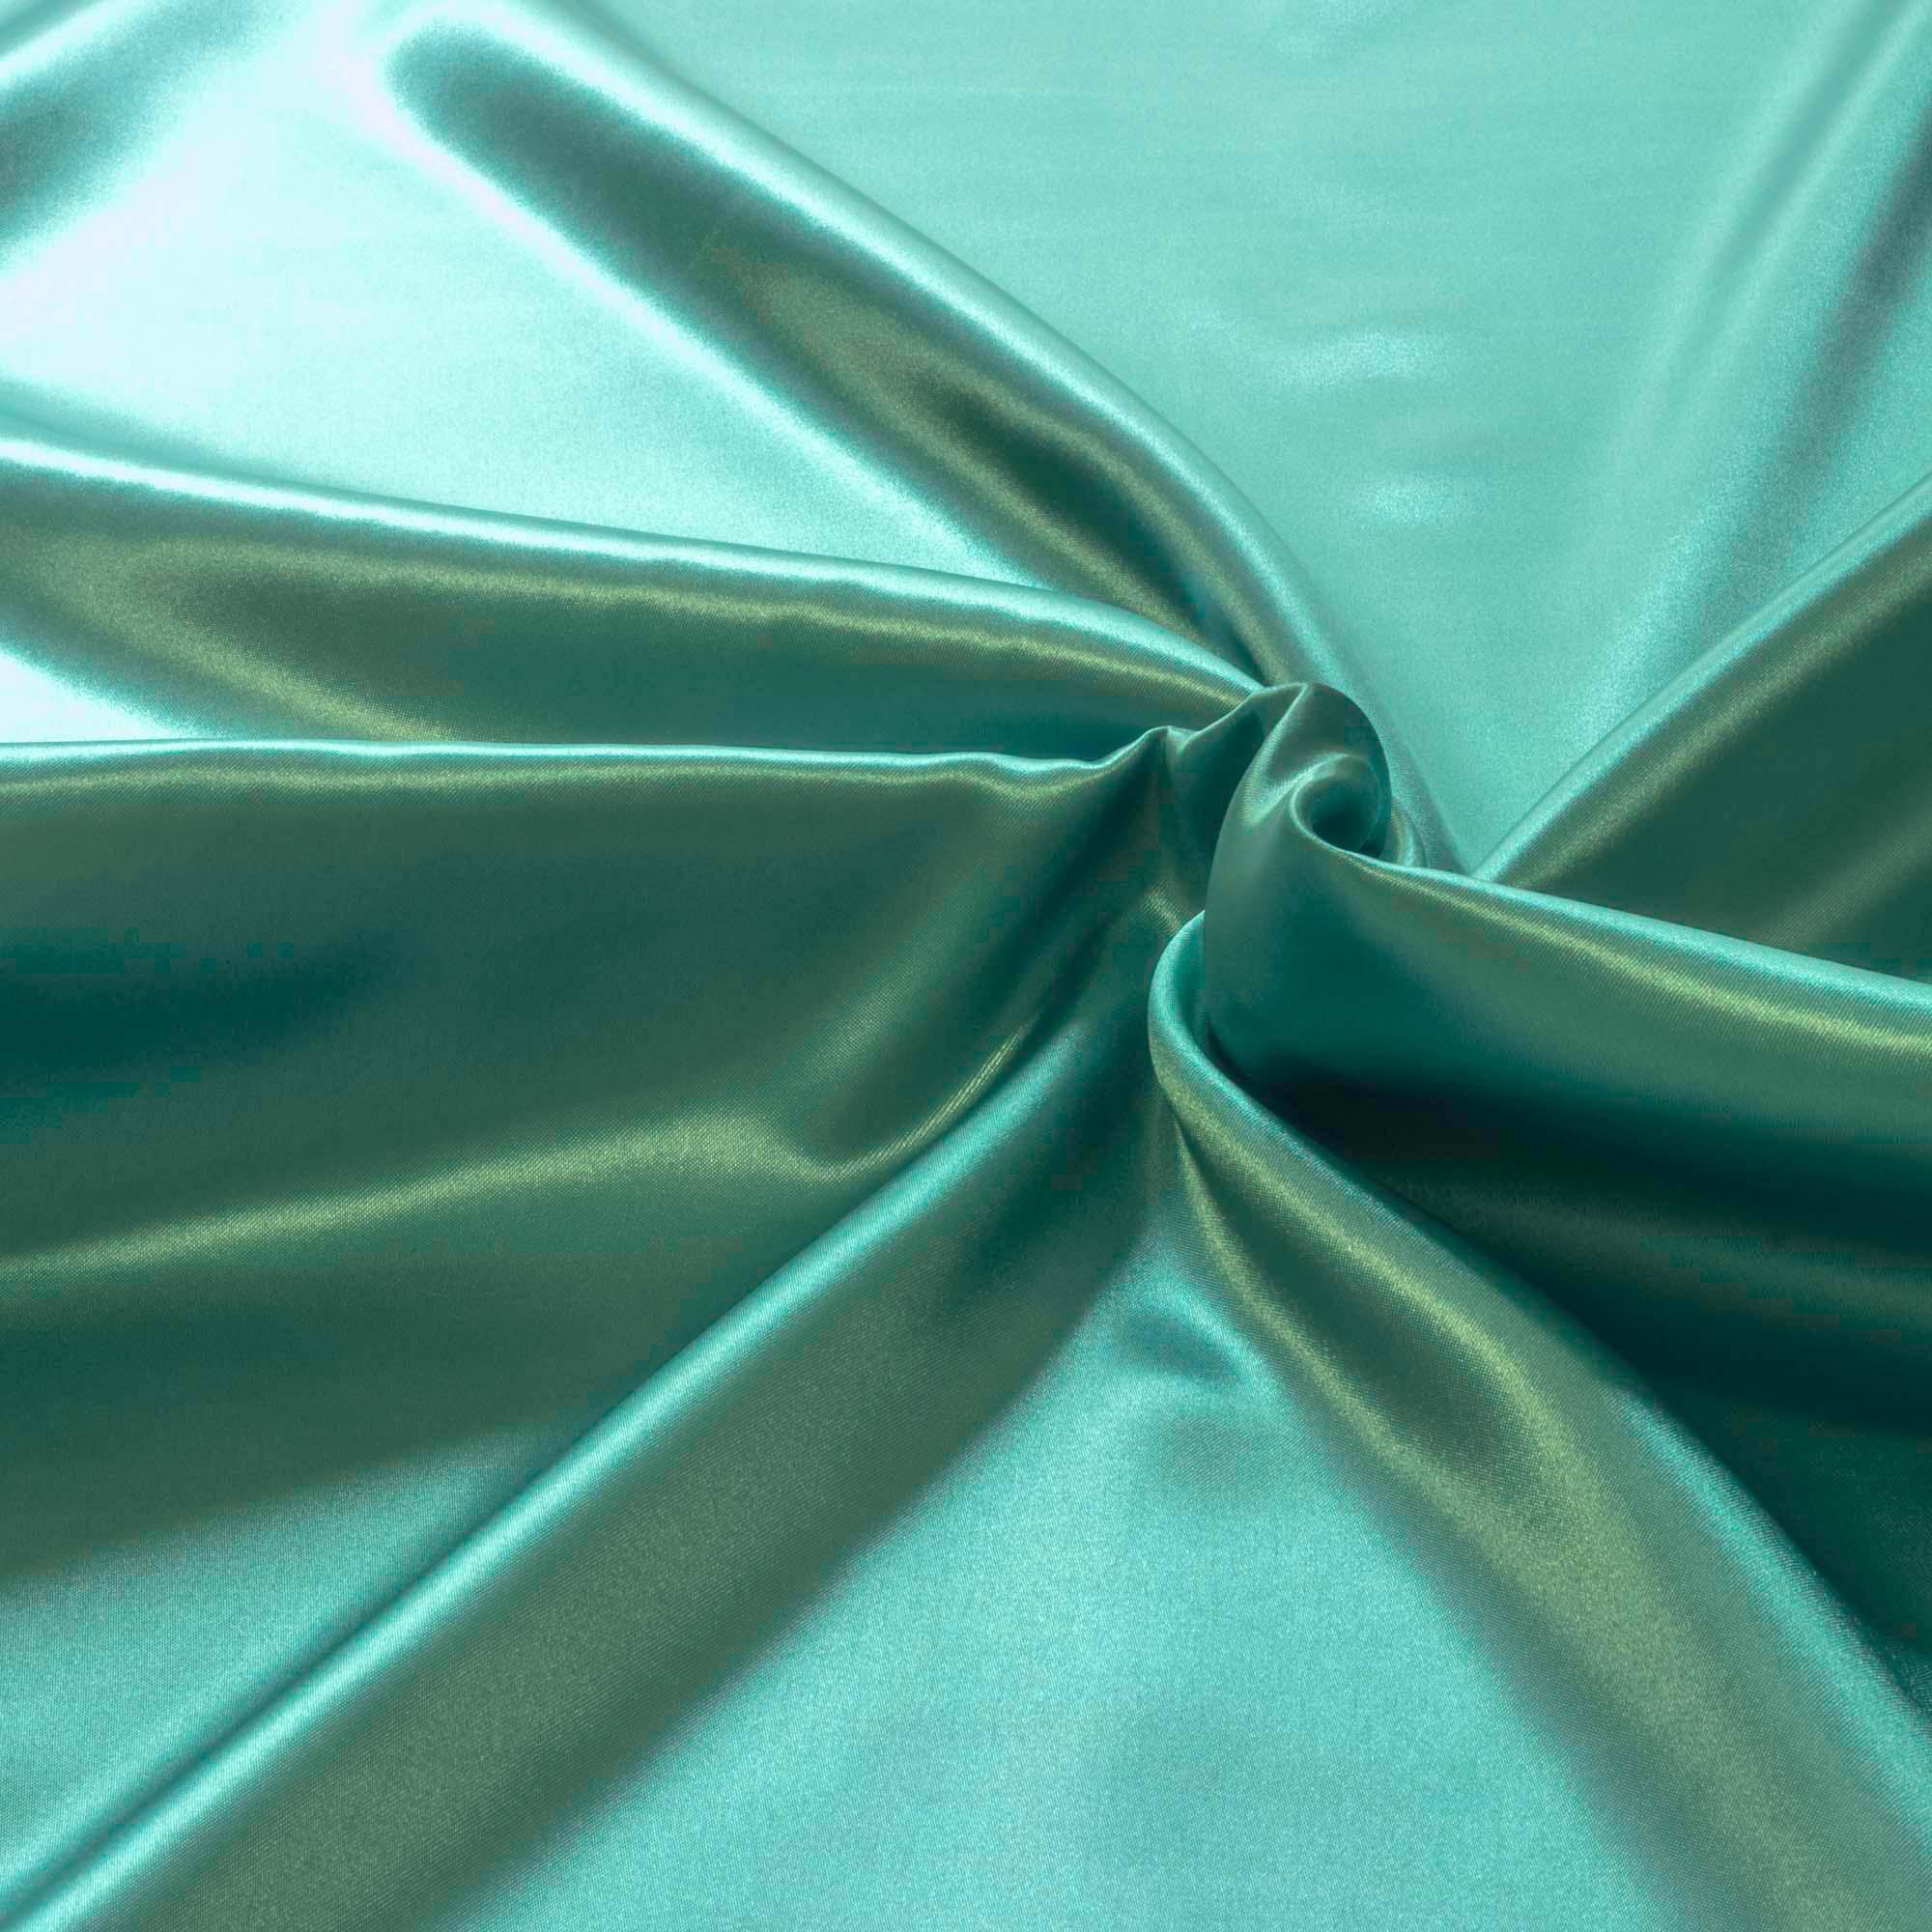 Tecido Cetim de Seda Charmeuse 1,50 Mt Largura Azul Tiffany